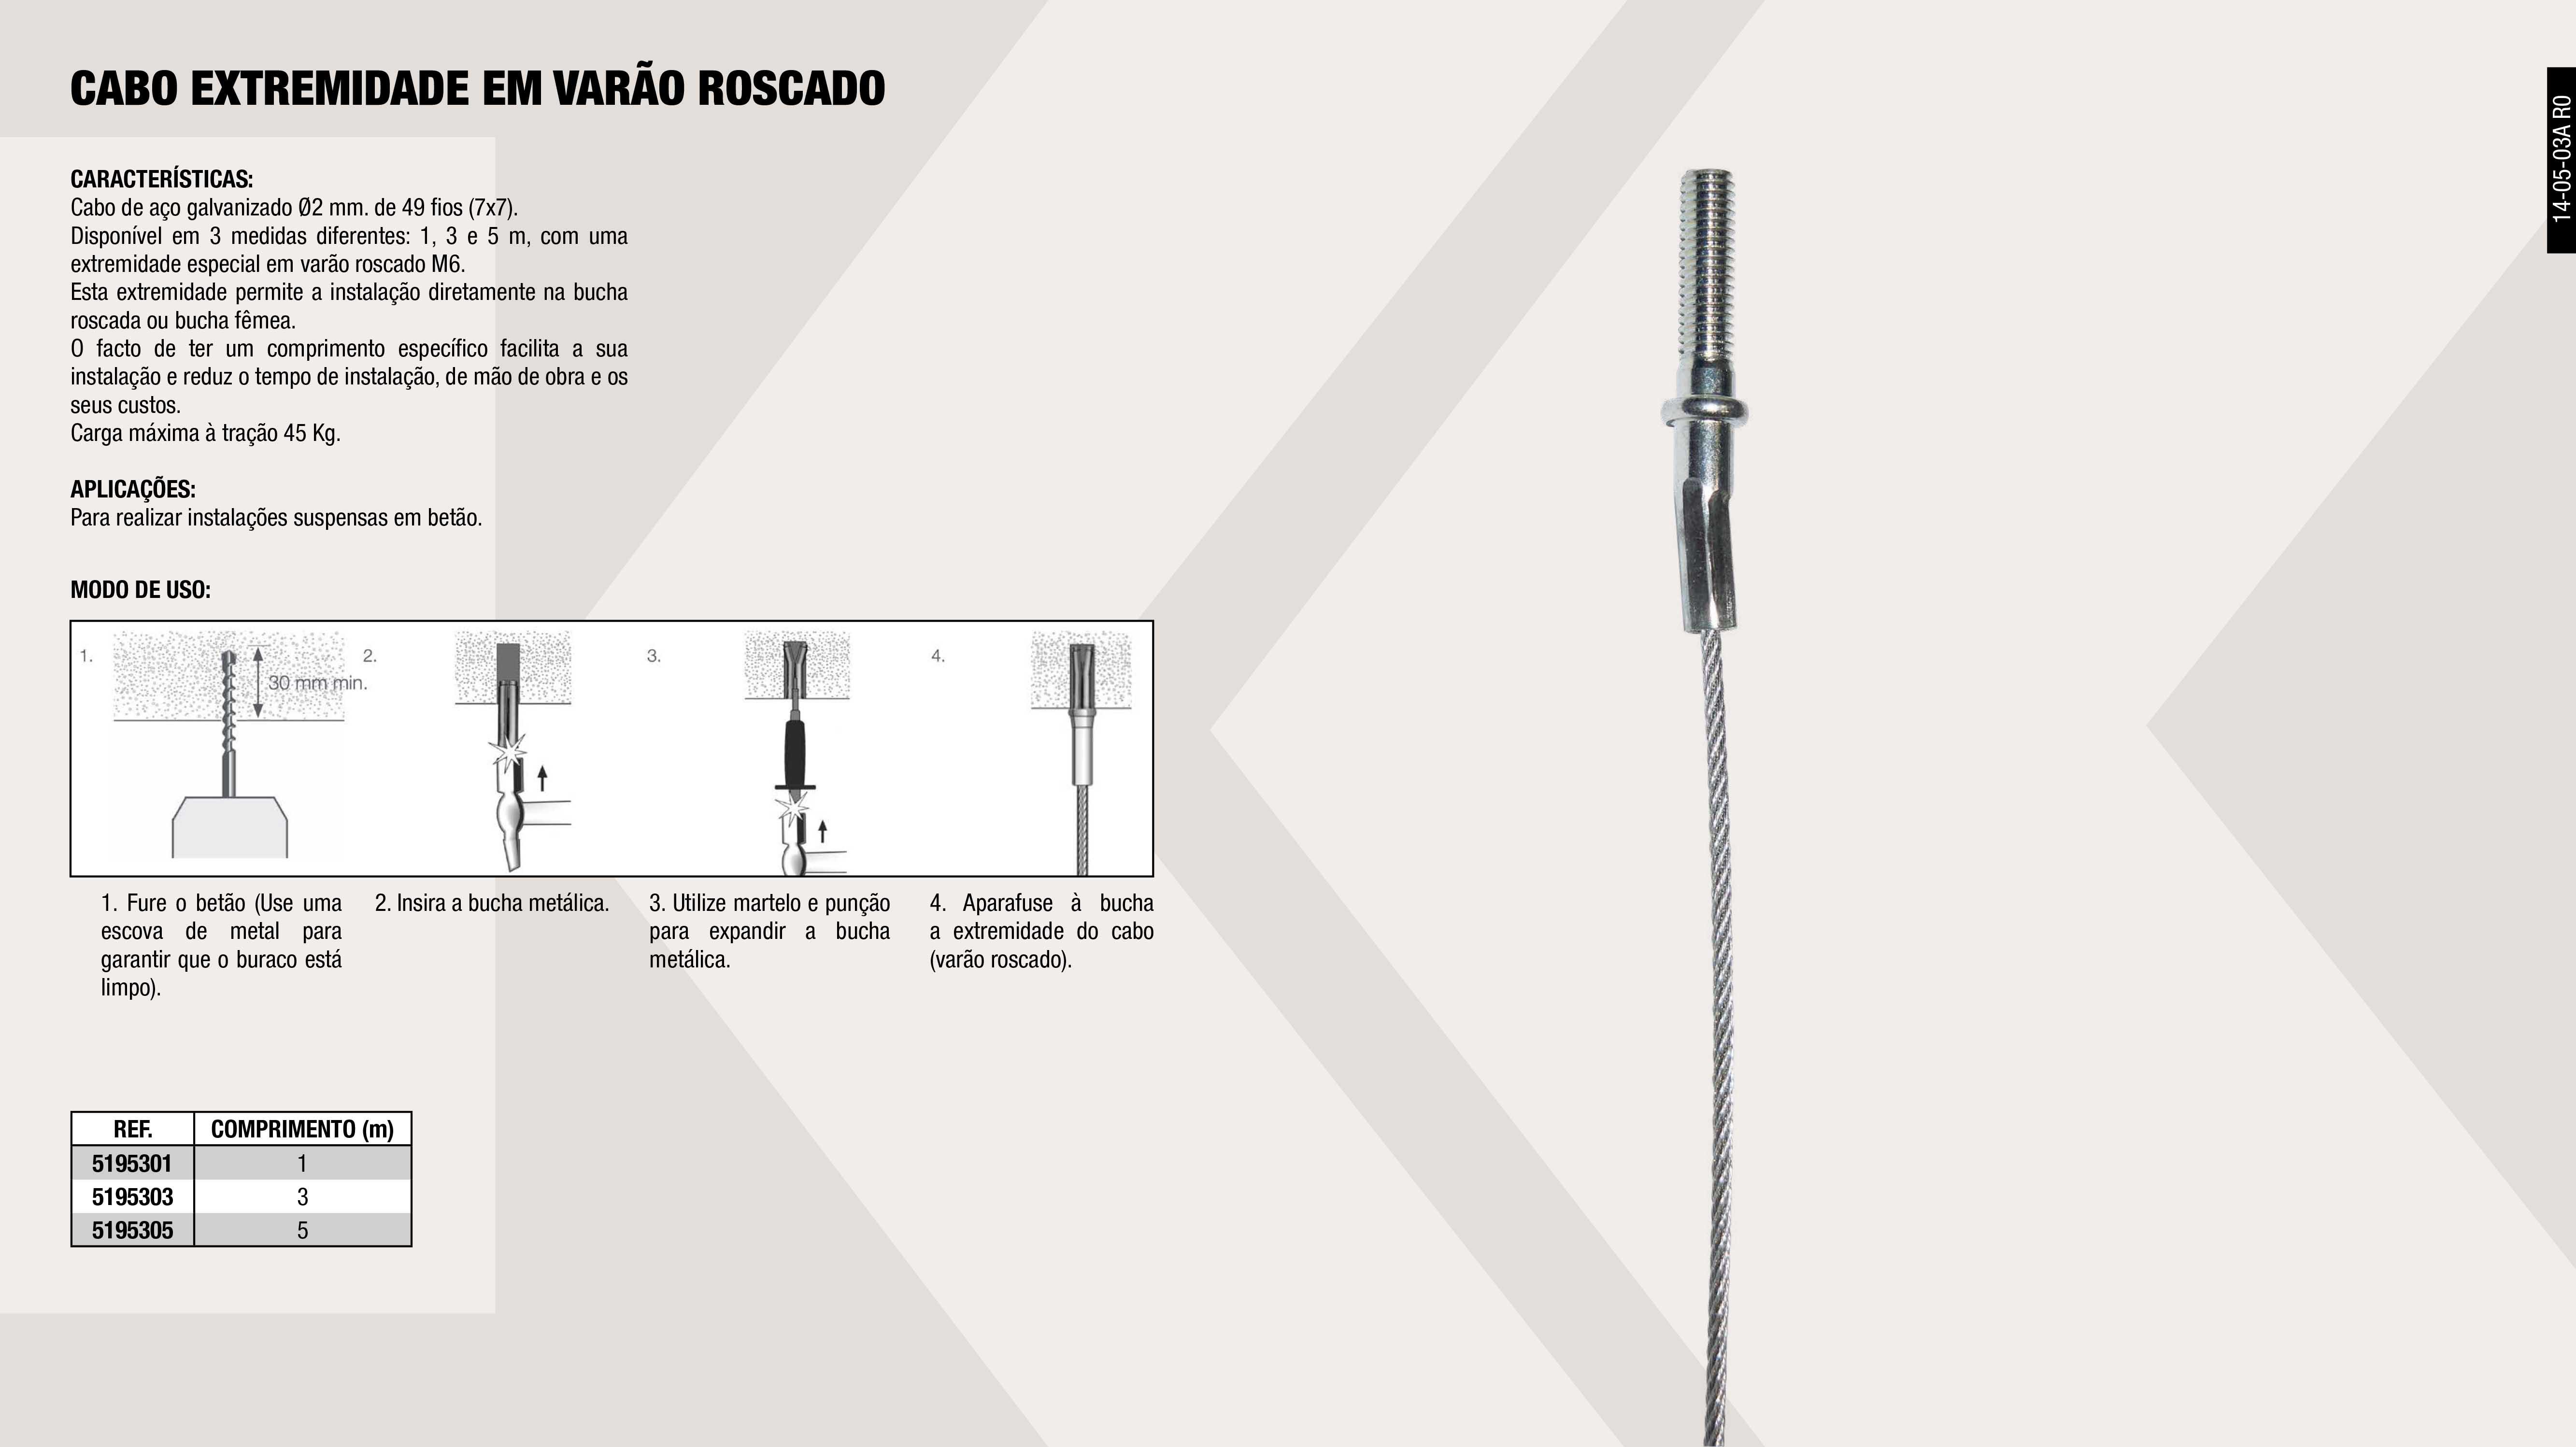 KIT SUPORTE SOLD.A.A.400X500X60 MM. (2U.)                   ,  KIT SUPORTE SOLD.A.A.500X500X60 MM. (2U.)                   ,  KIT SUPORTE SOLD.A.A.600X500X60 MM. (2U.)                   ,  KIT SILENTBLOCKS A-35 (4U.)                                 ,